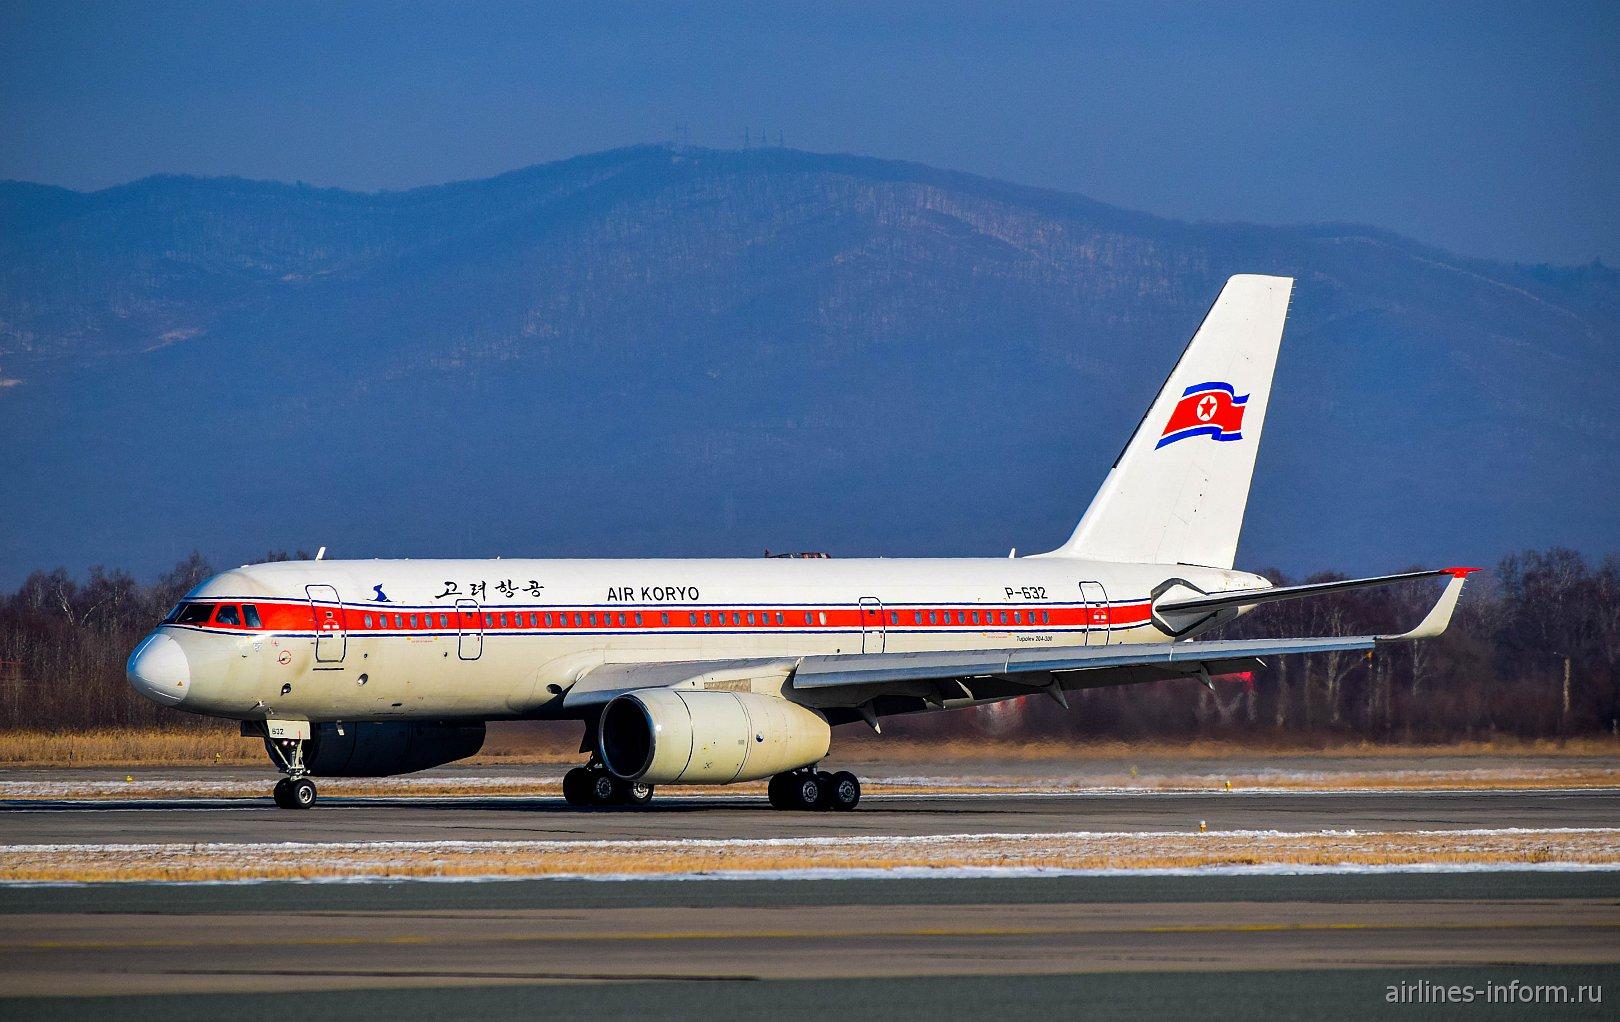 Самолет Ту-204-300, номер P-632, авиакомпании Air Koryo